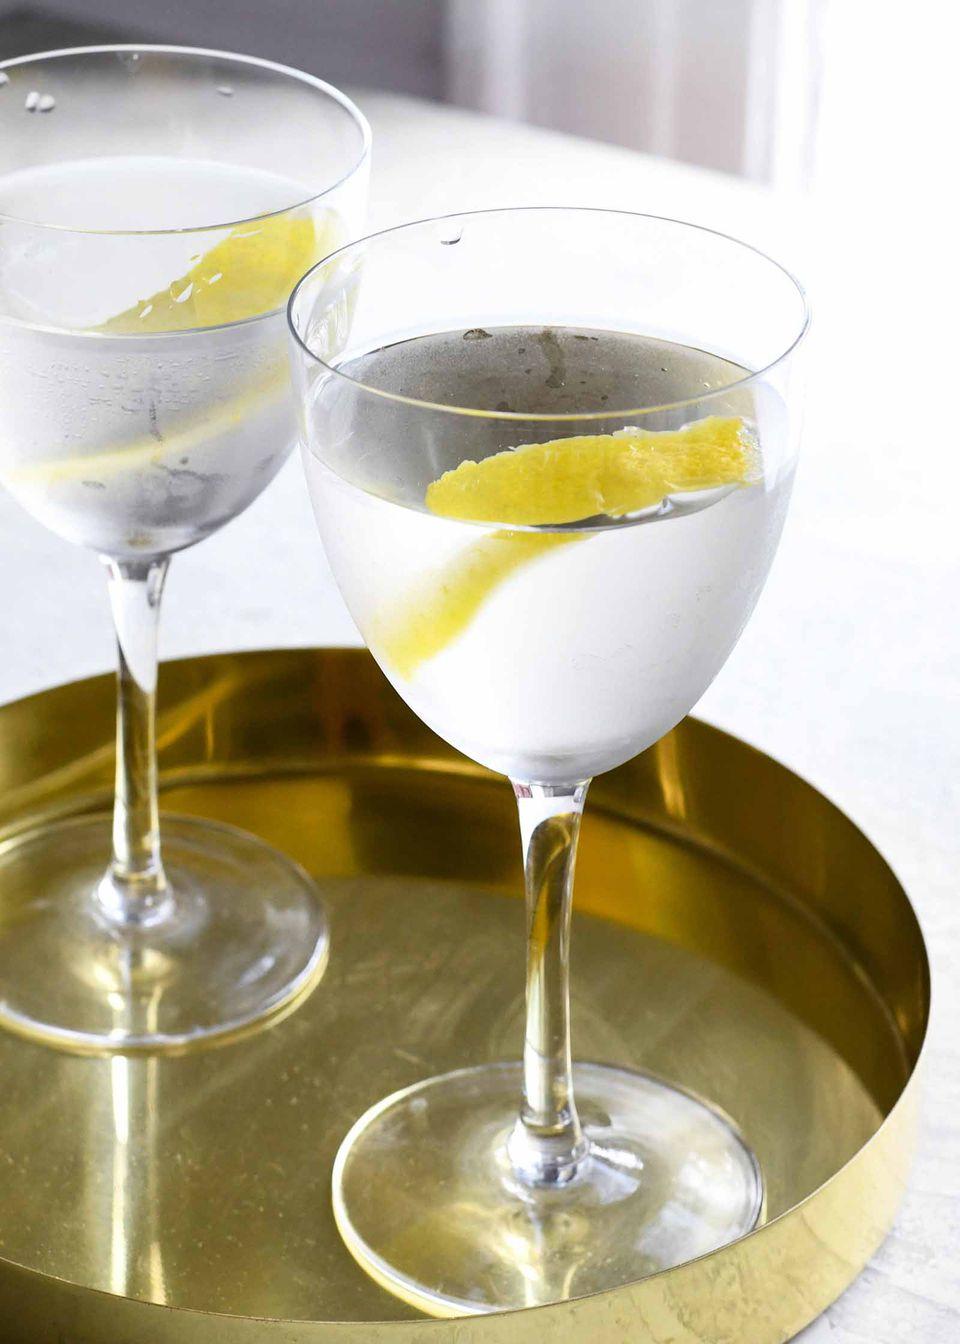 Dry Martini Recipe vodka martini in glass with lemon peel garnish